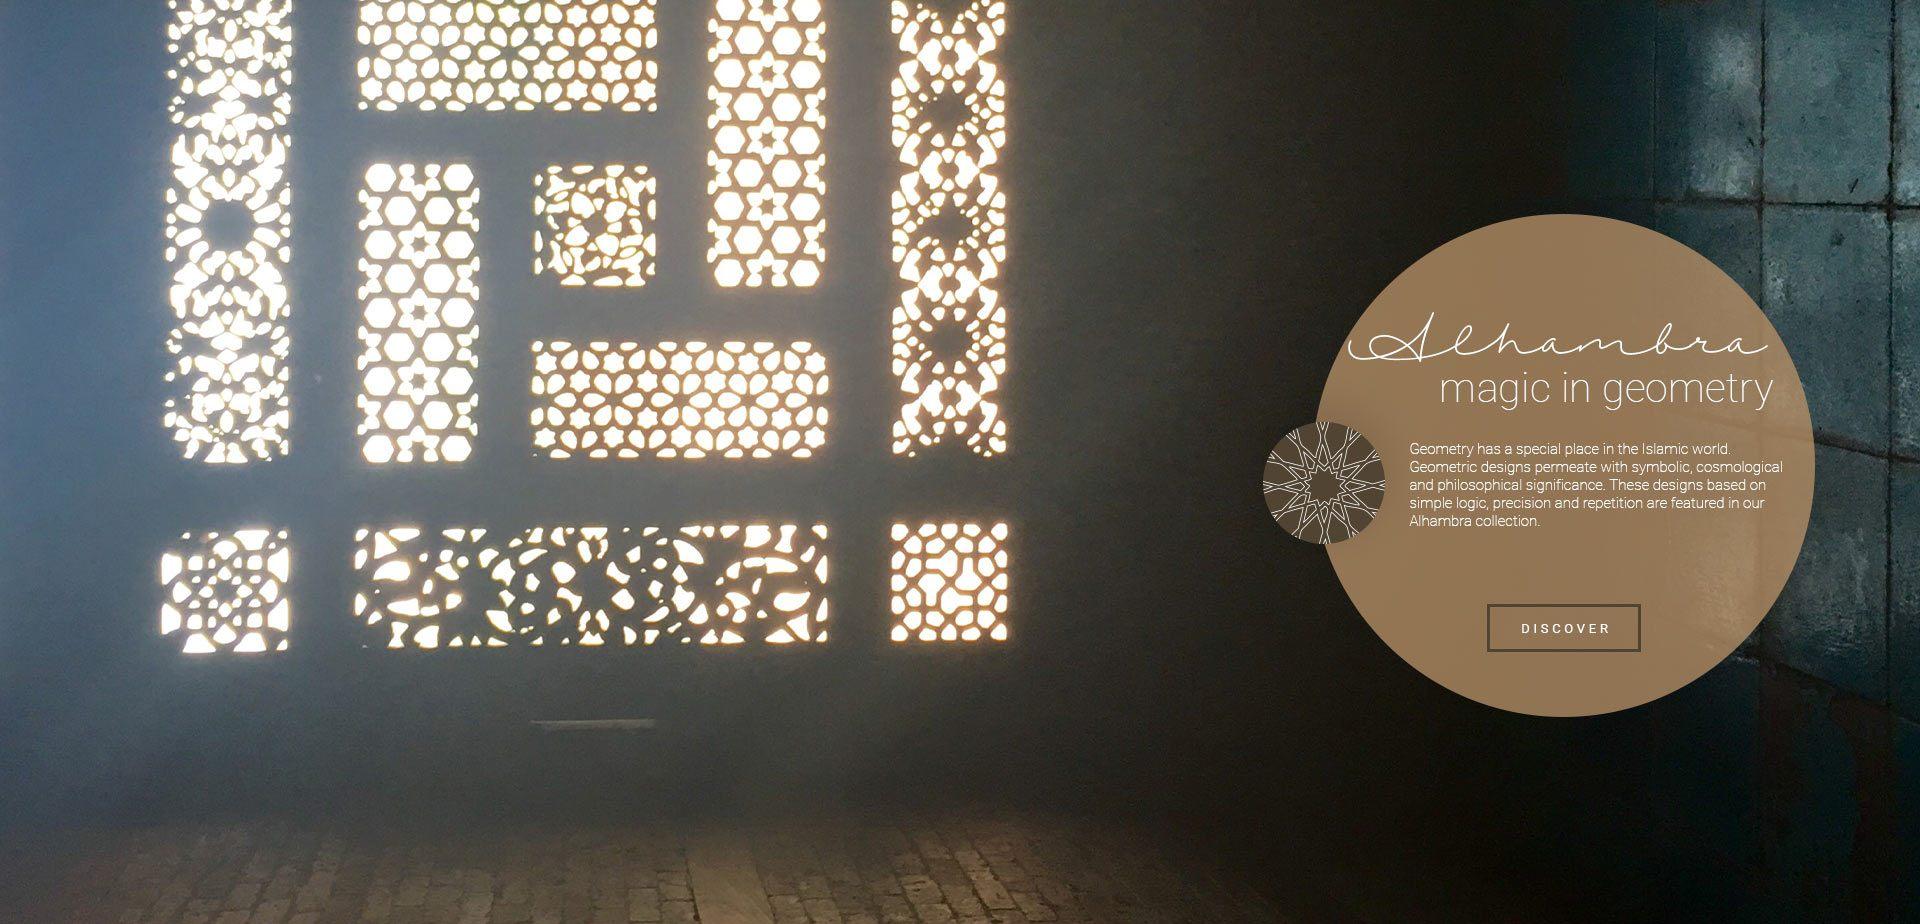 Alhambra - matric in geometry